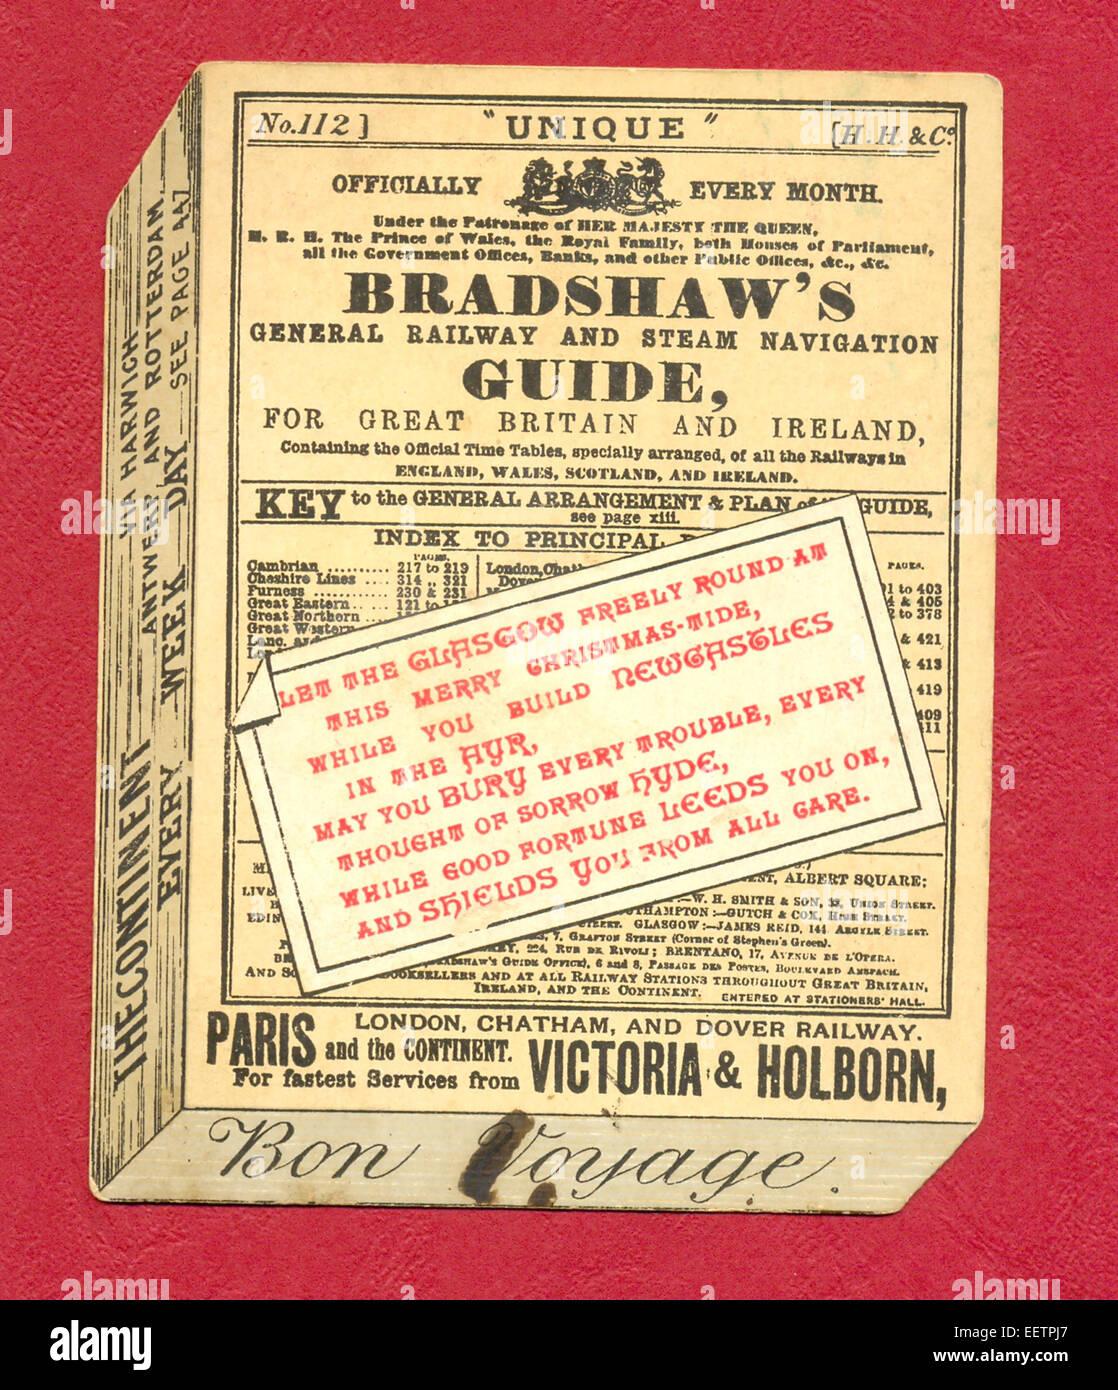 victorian greeting card as bradshaw s railway guide stock photo rh alamy com bradshaw's railway guide 1913 bradshaw railway guide first edition